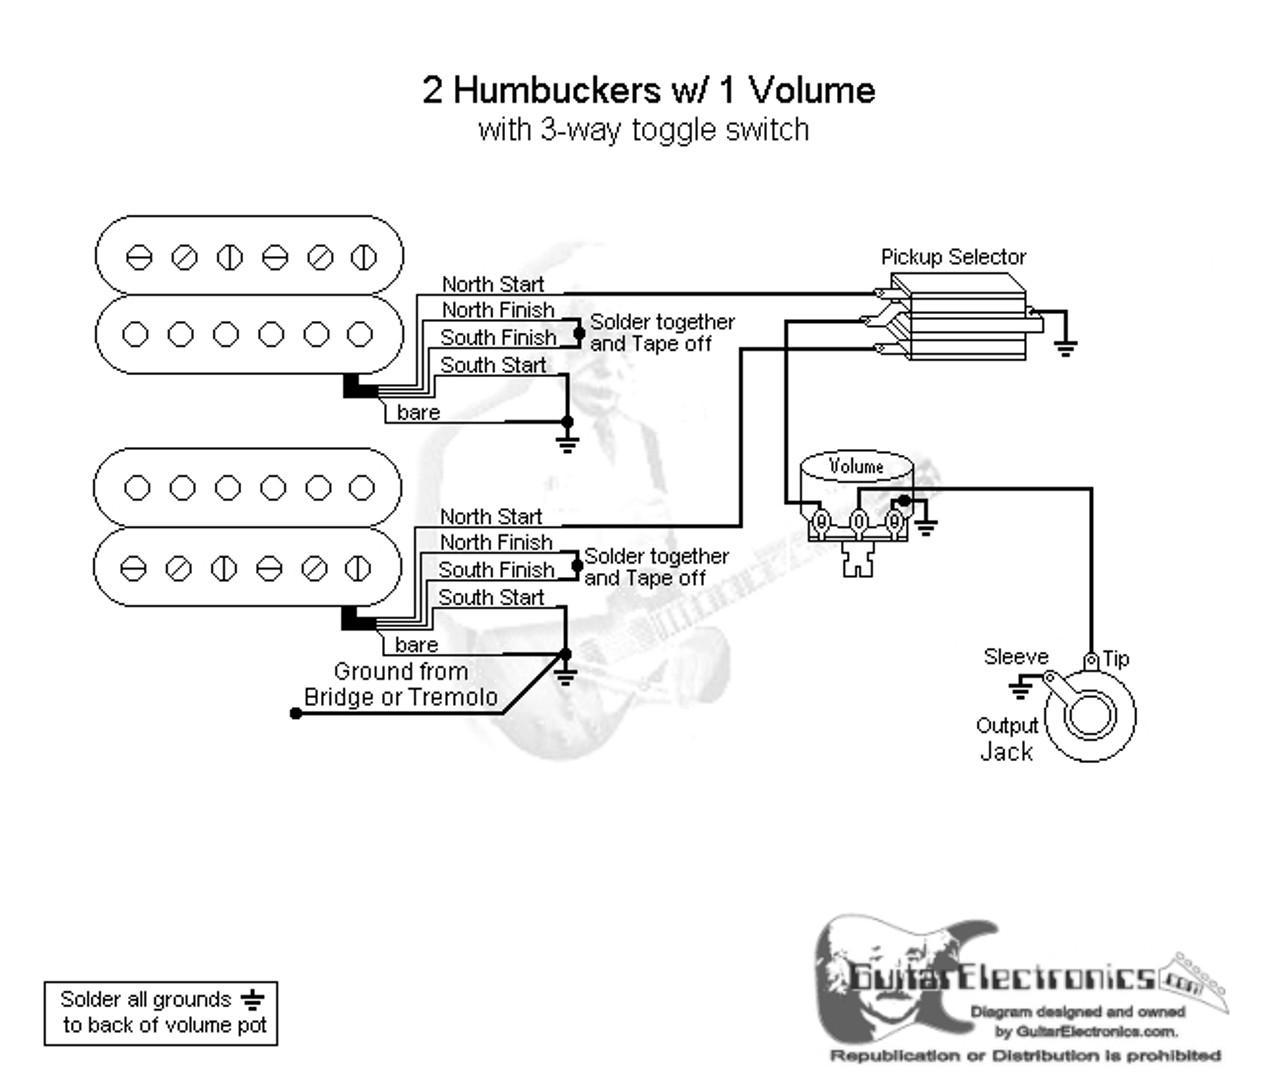 medium resolution of humbucker single 1 volume 3 way switch wiring diagram humbuckers2 humbuckers 3 way toggle switch 1